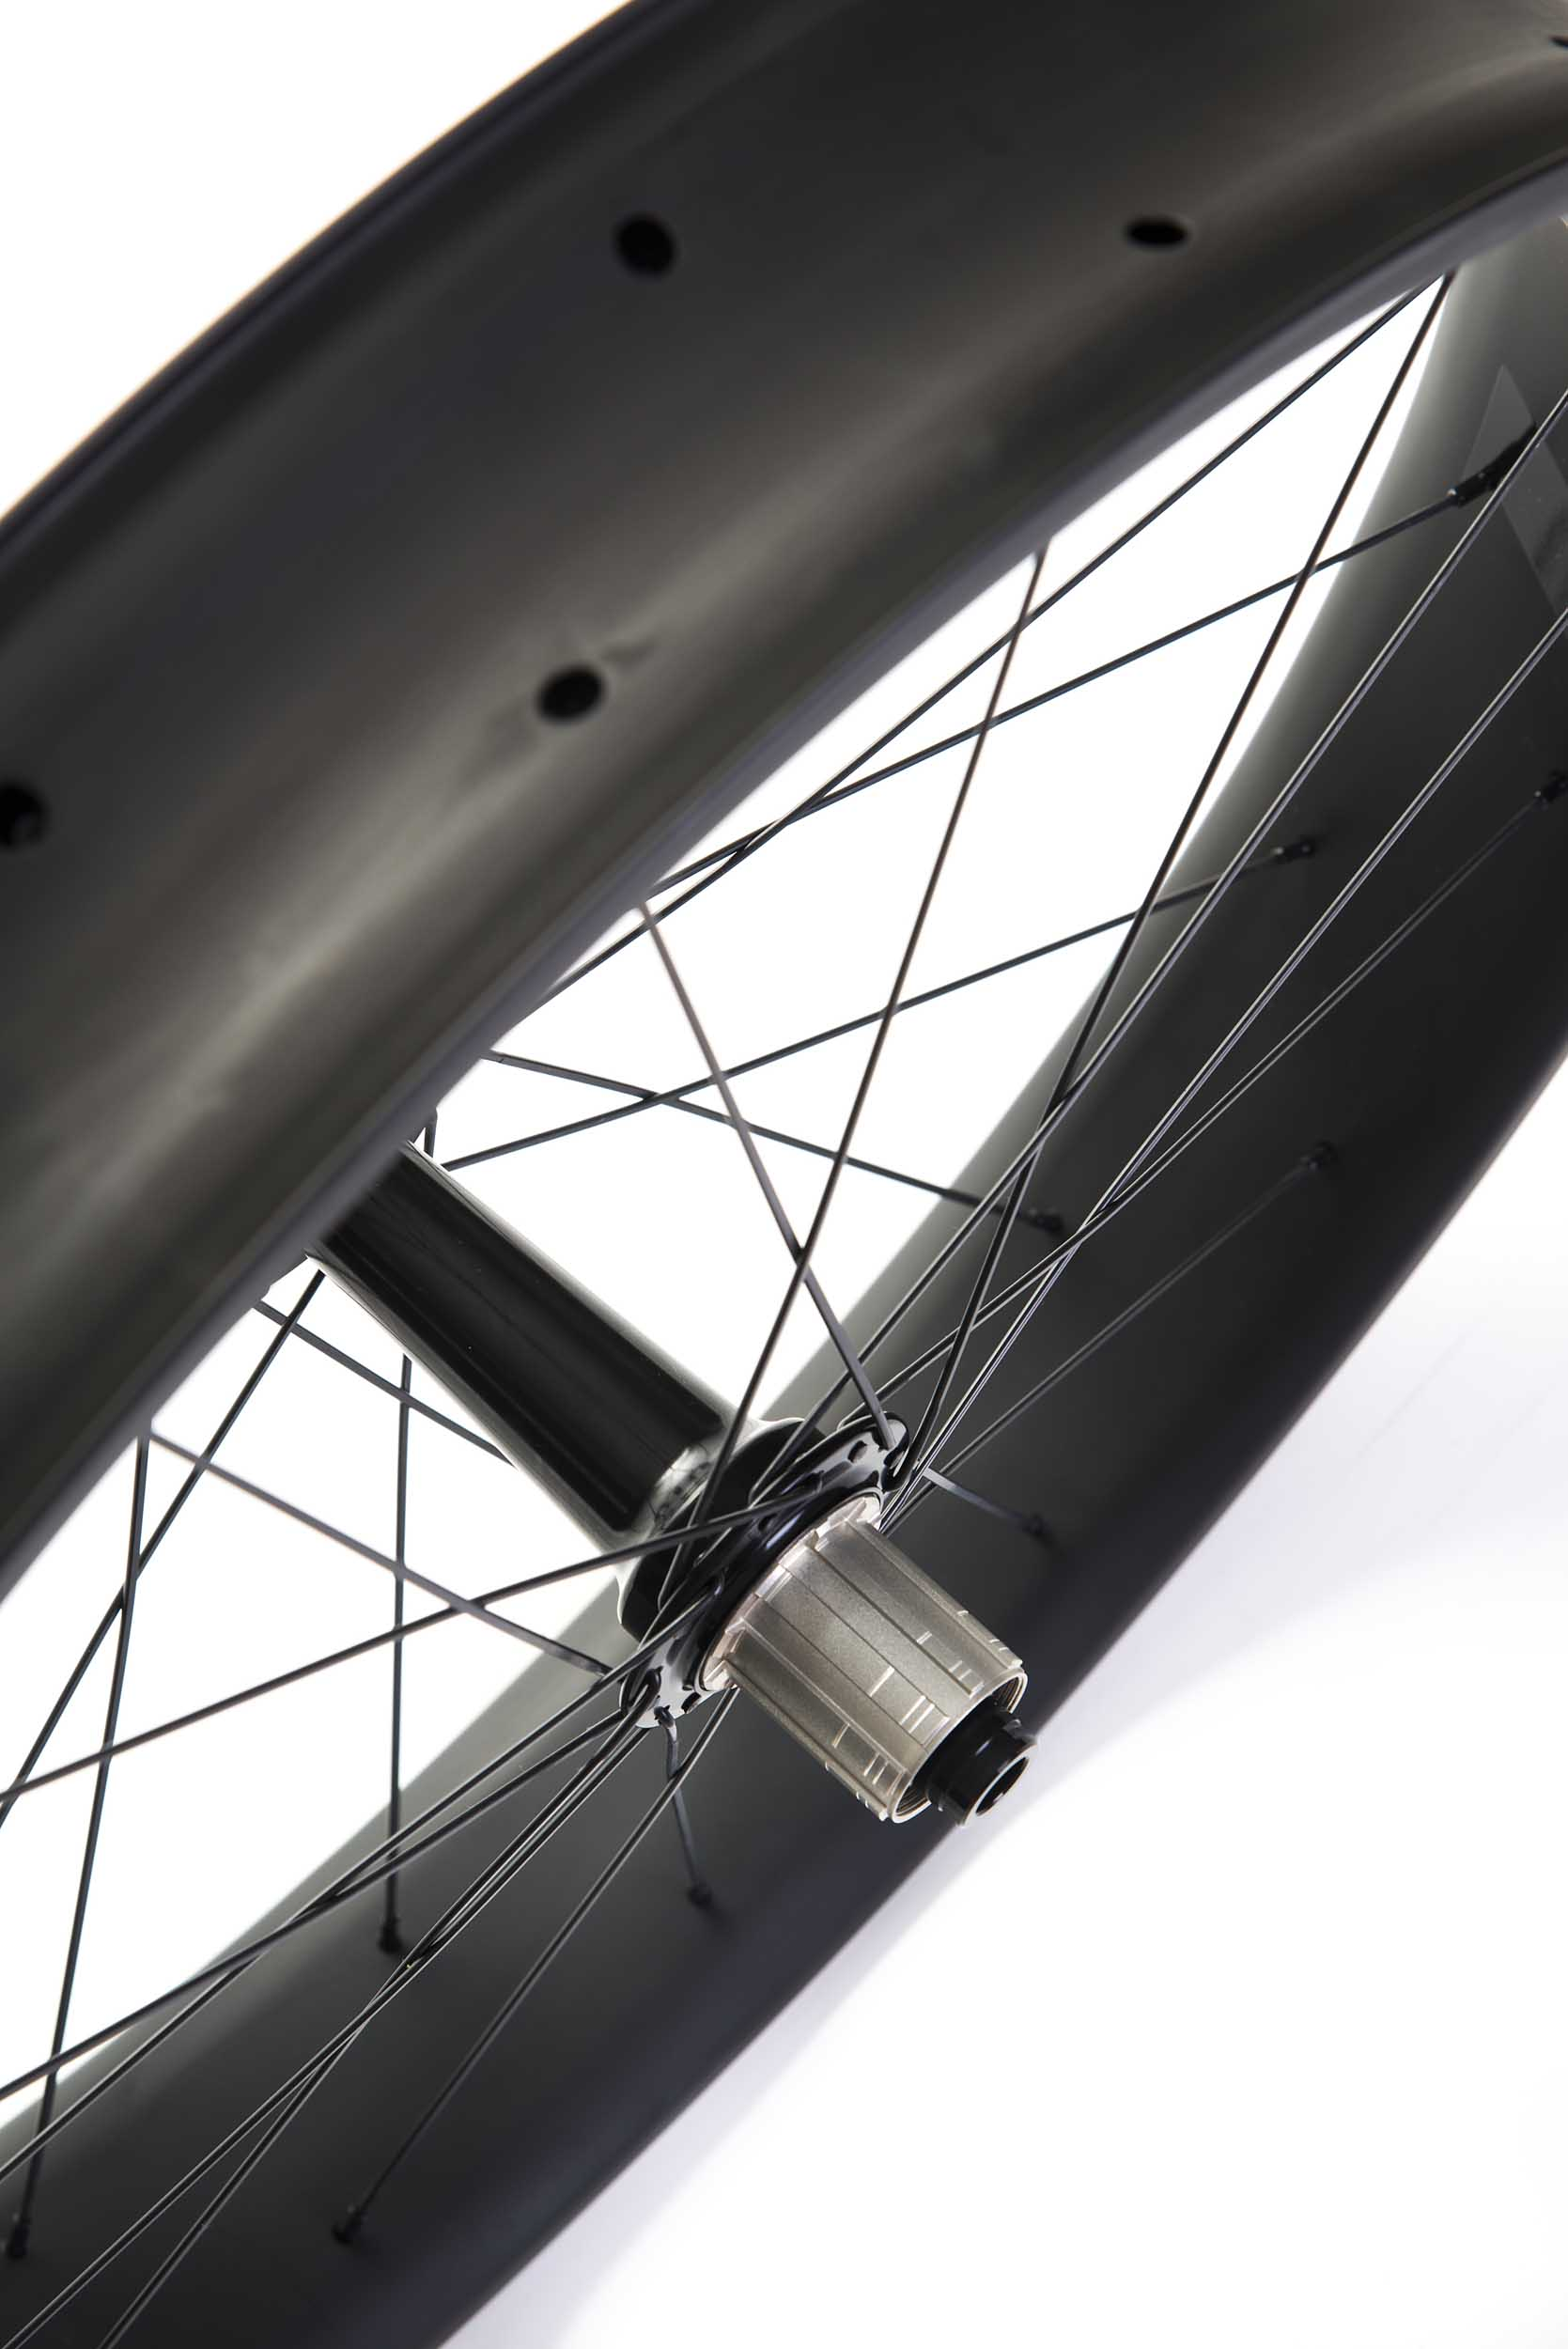 lios-carbon-fatbike-wheelset-black-image-6.jpg